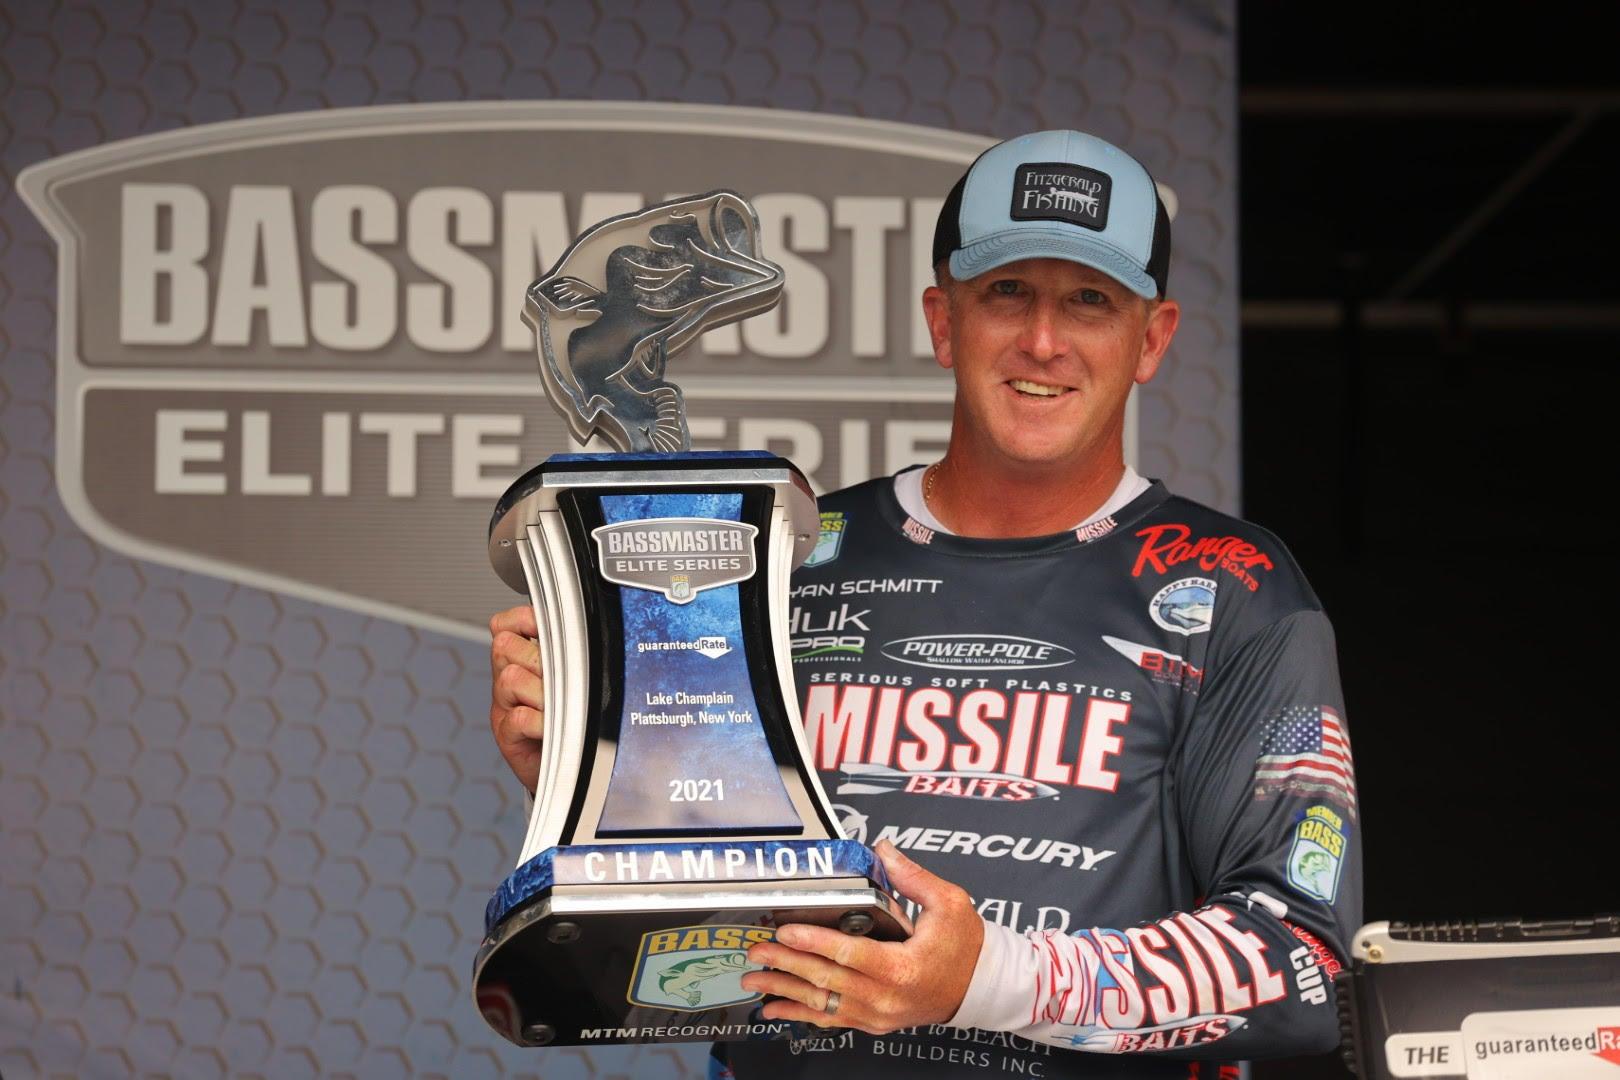 Schmitt Wins 2021 Elite Series Event on Lake Champlain